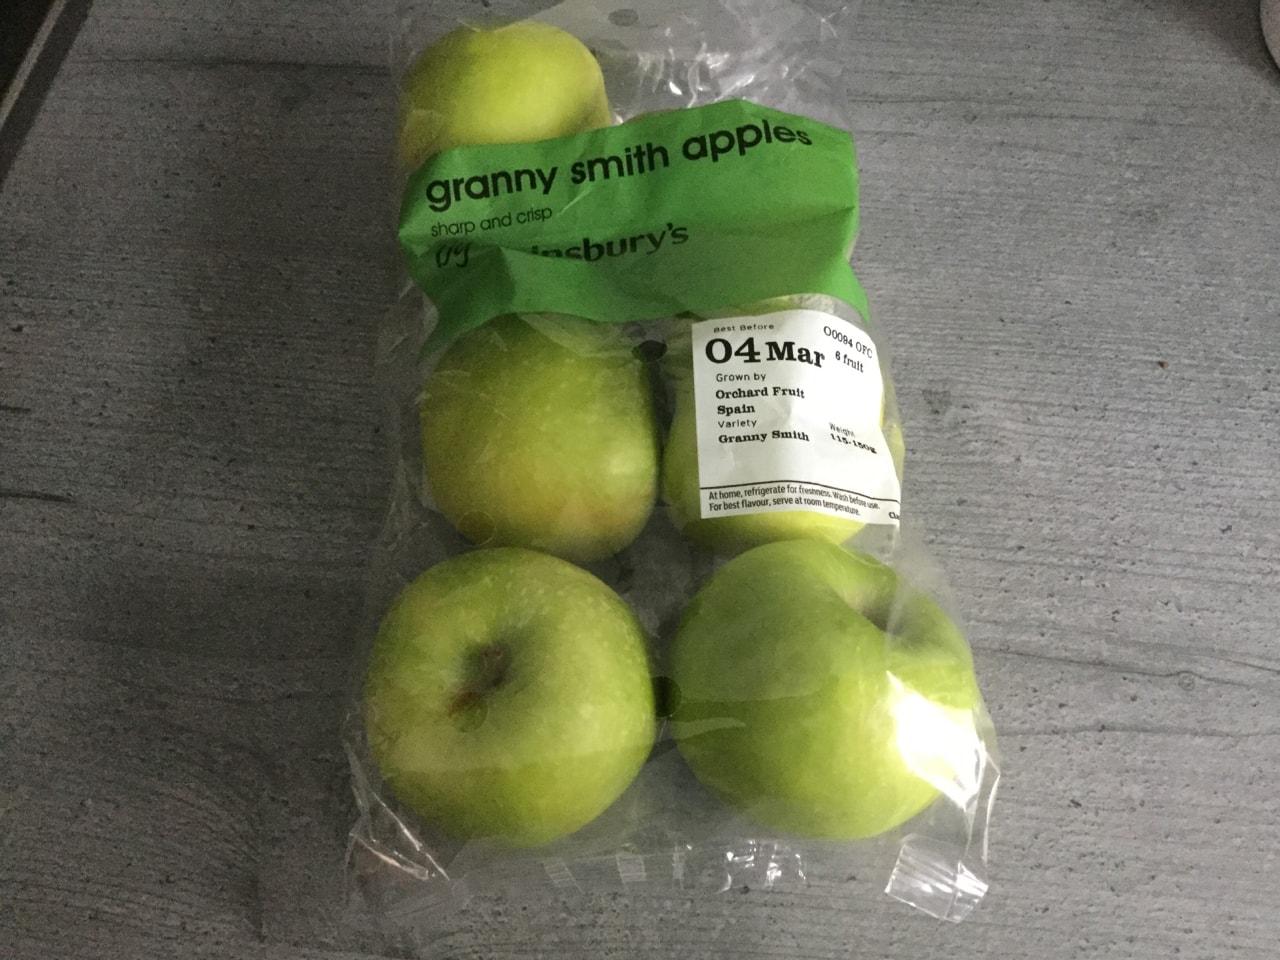 Granny Smith apples 🍏